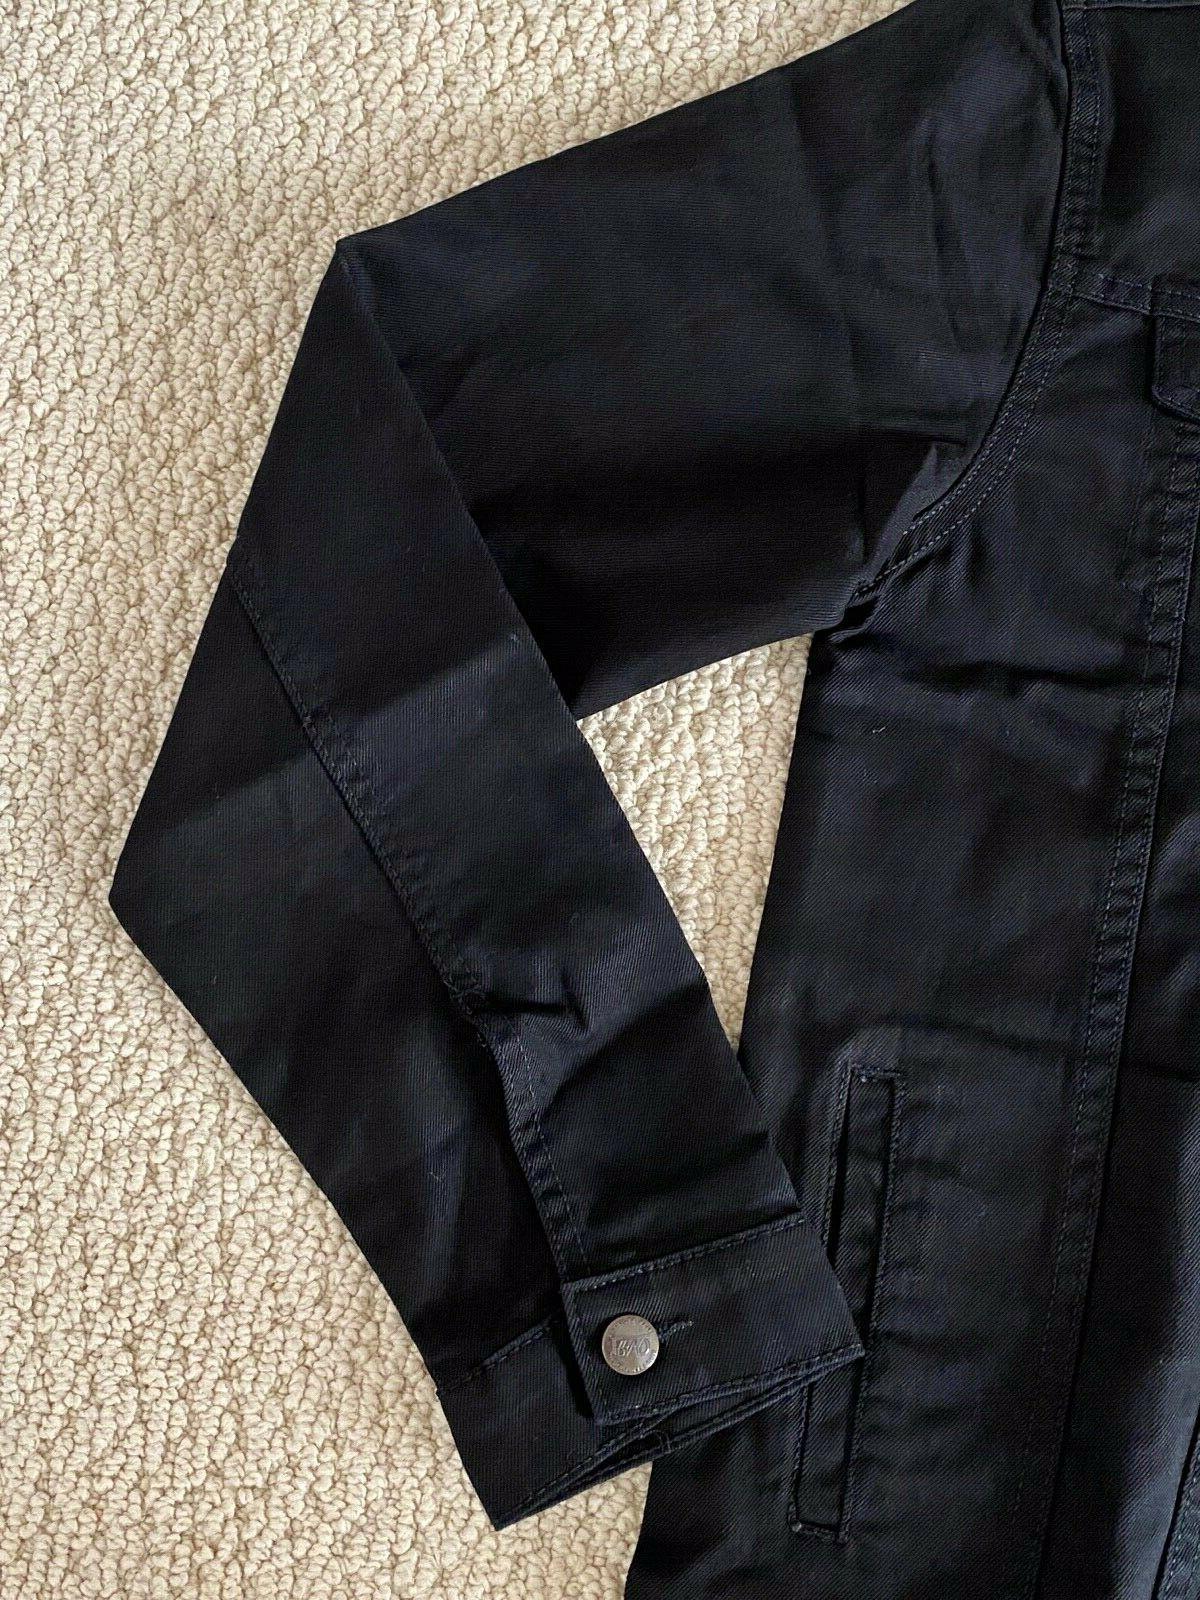 Classic Black Button Denim Jean SIZES